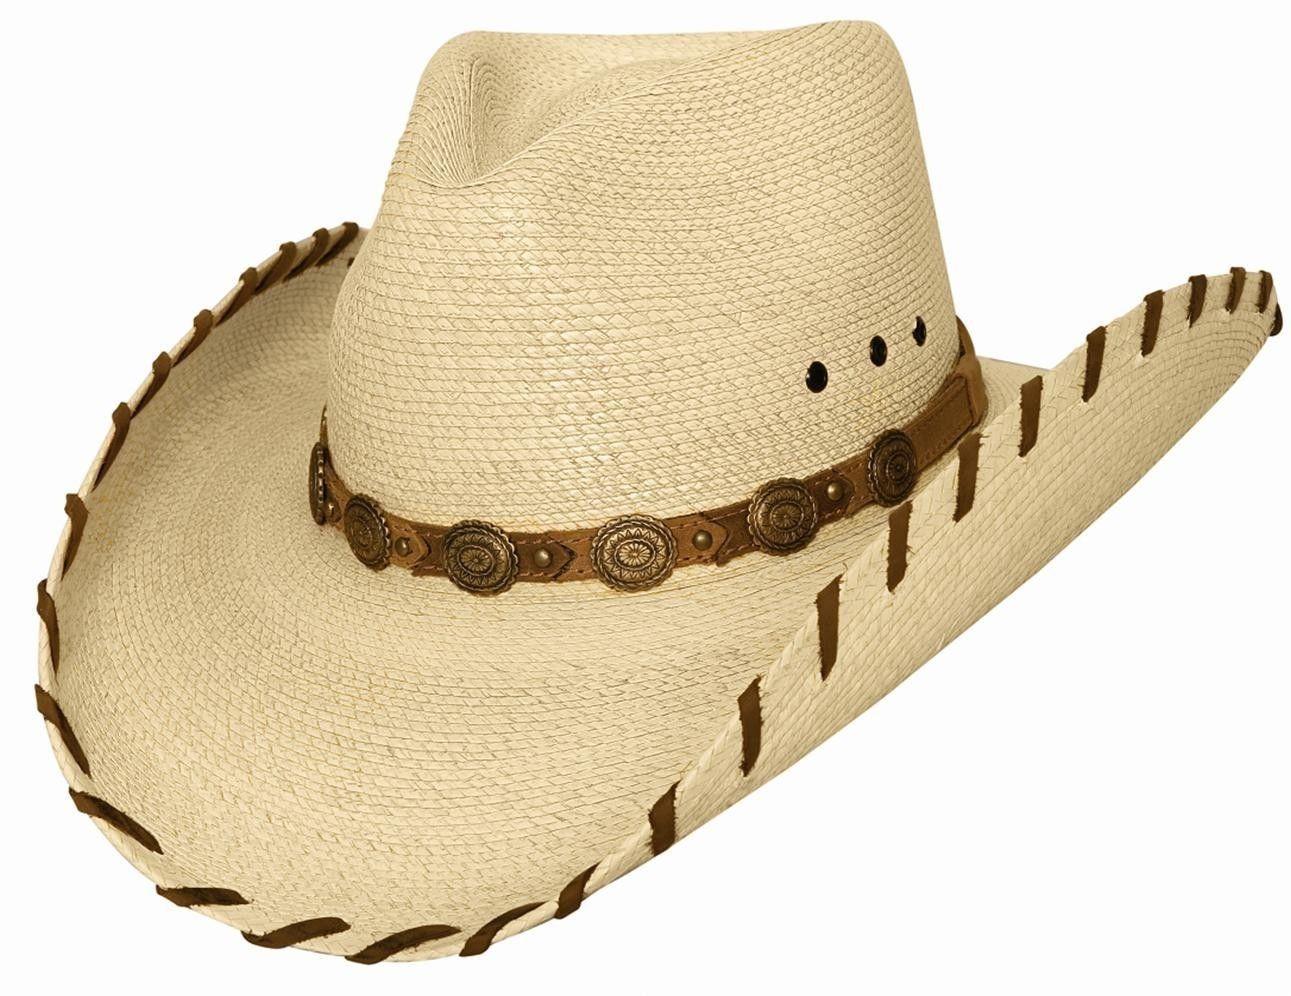 f590547d3175a t2ec16hhjhufffkzgh qbri 1vj z 60 57. t2ec16hhjhufffkzgh qbri 1vj z 60 57.  Previous. NEW Montecarlo Bullhide Hats DREAMER 15X PALM LEAF Straw Western  Cowboy ...